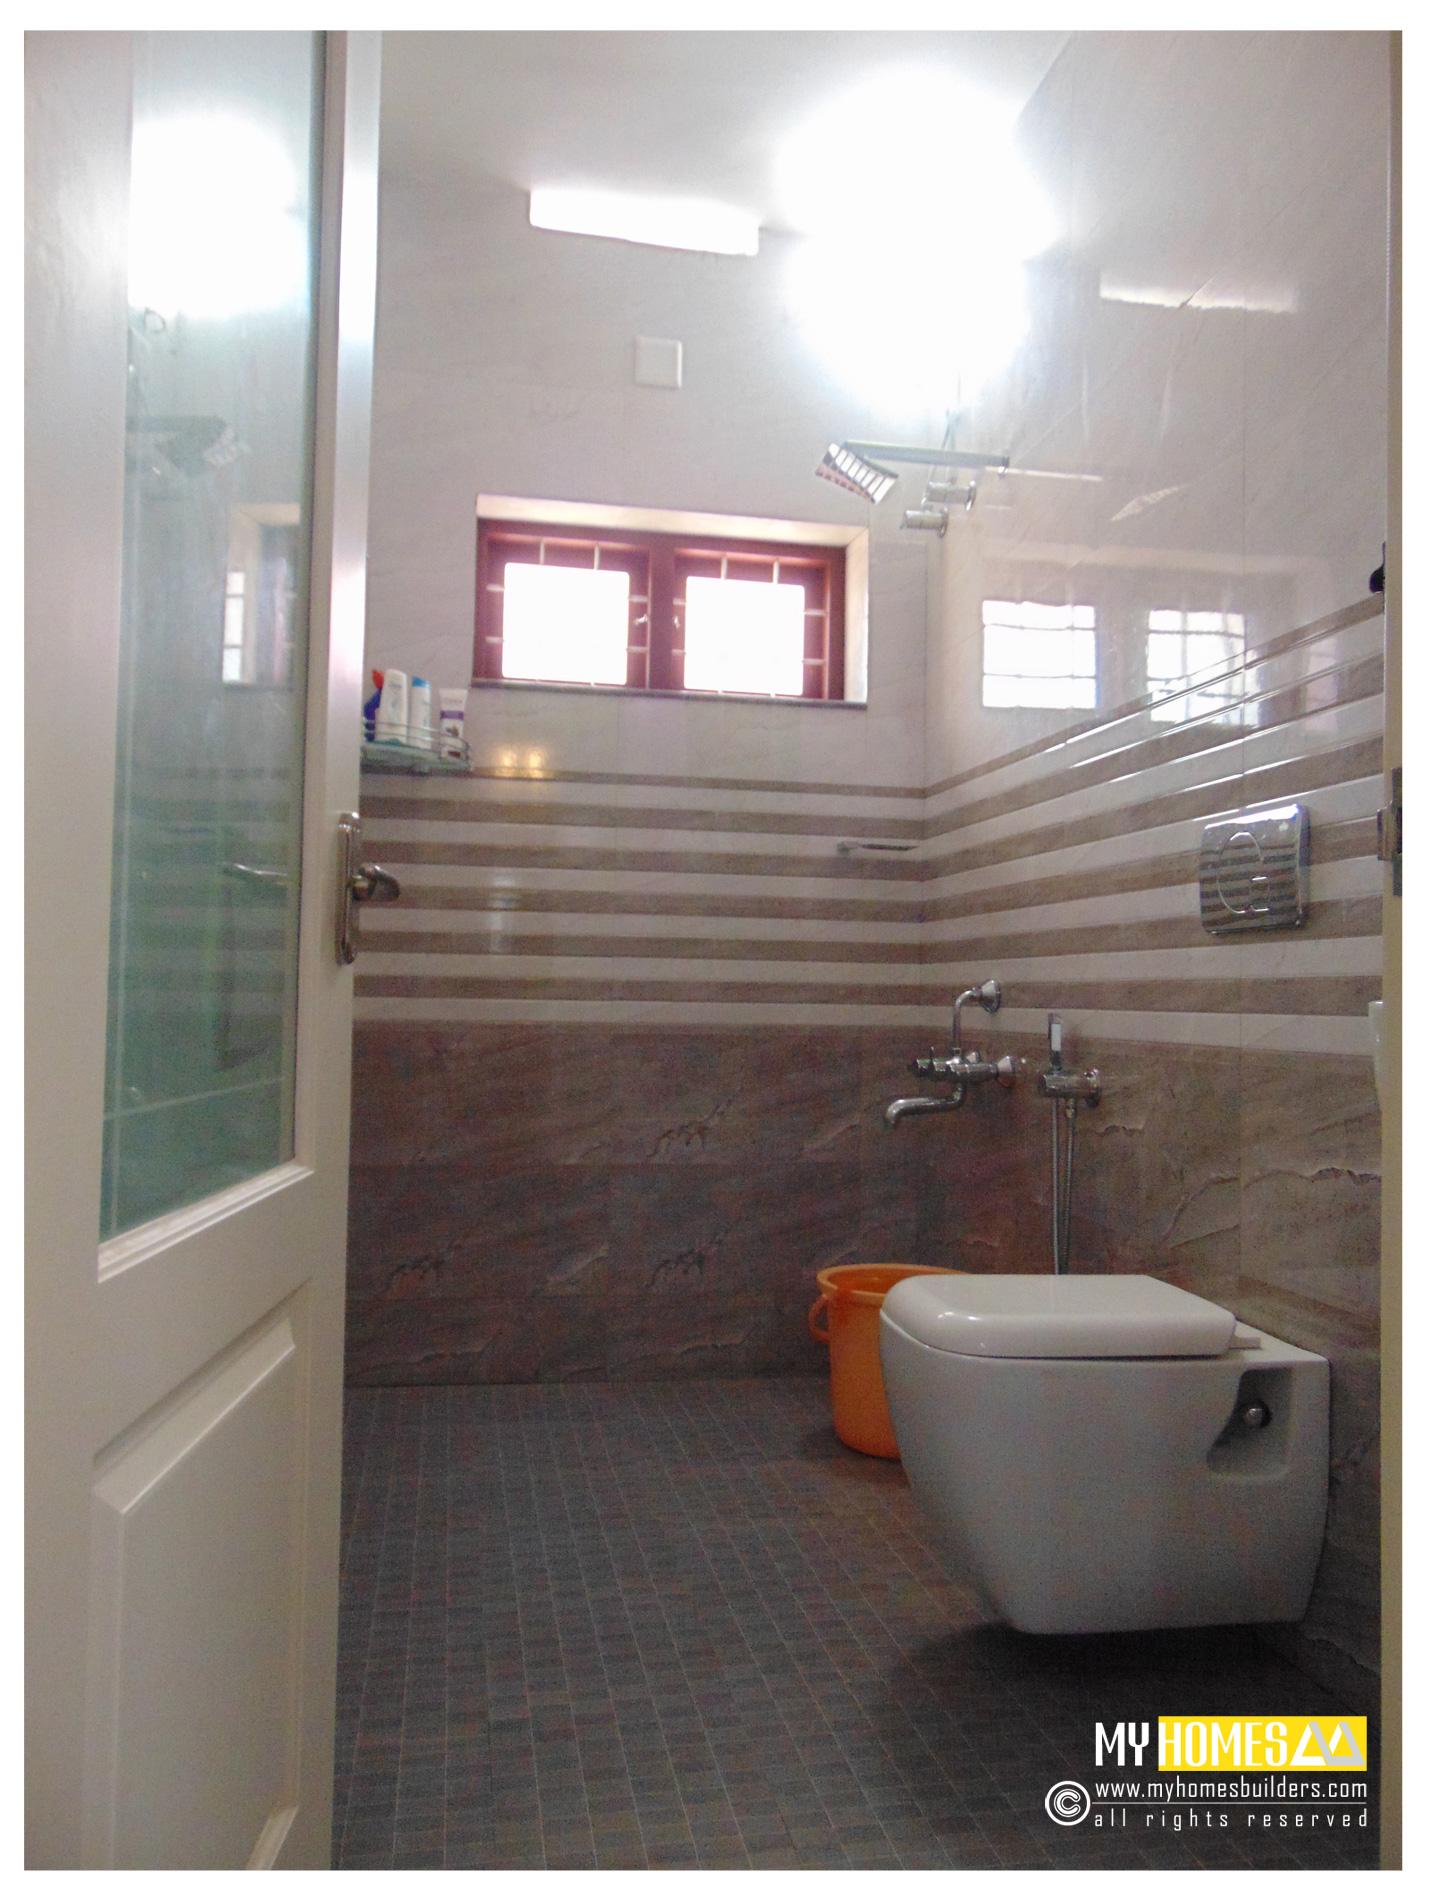 Bathroom designs in kerala photos and ideas from my homes on Bathroom Model Design  id=39908